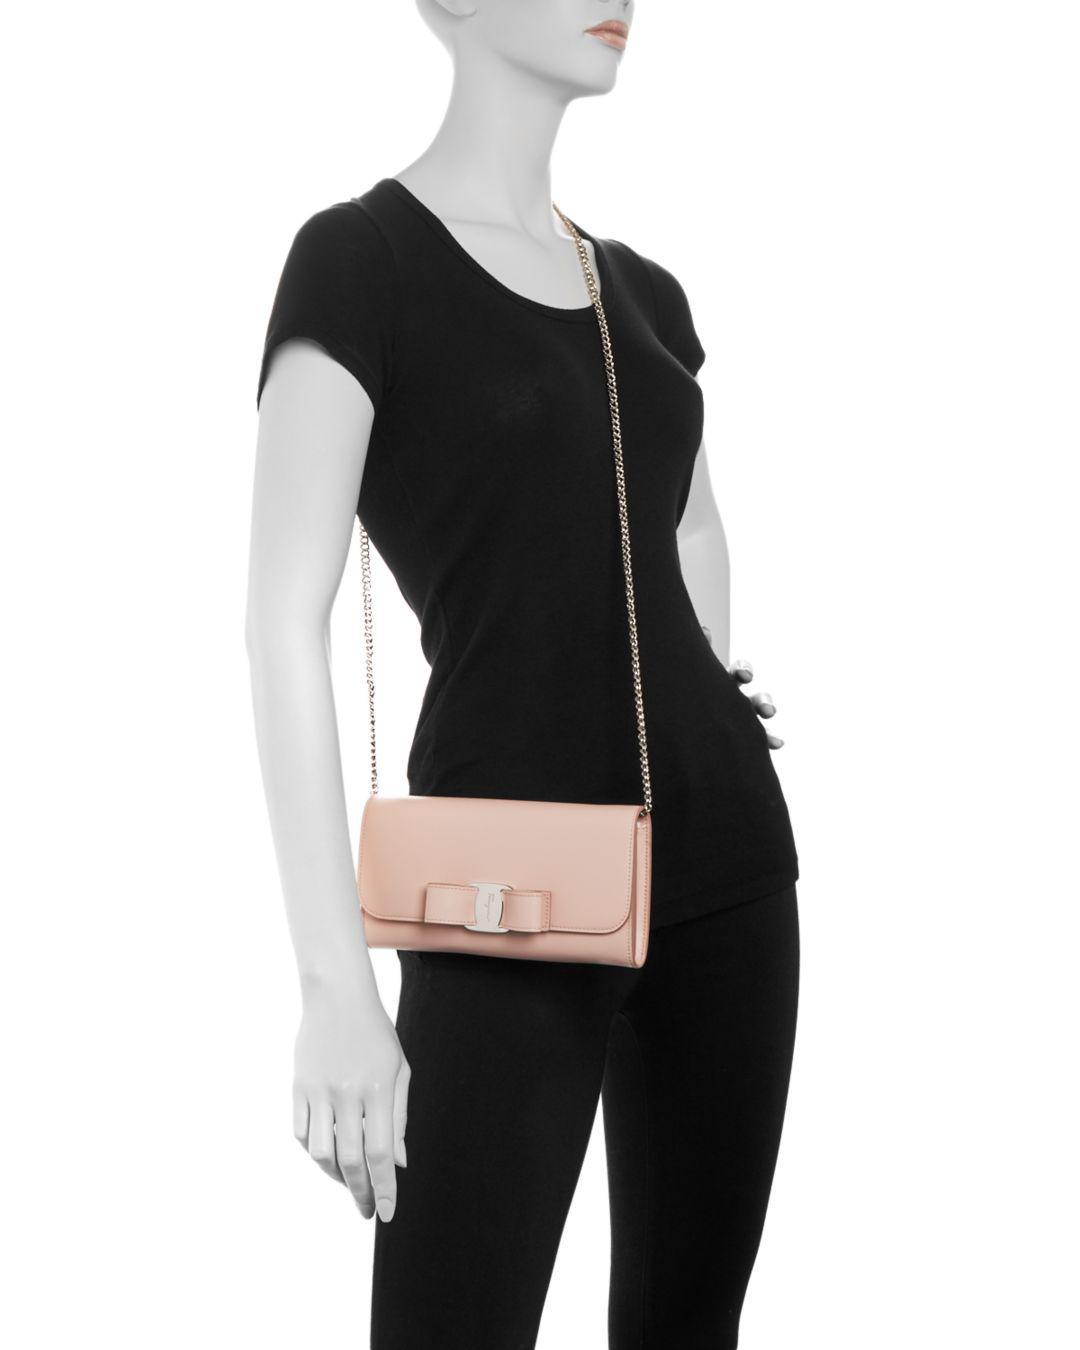 Lyst - Ferragamo Oversized Vara Bow Mini Bag in Pink 6e132d55f363a